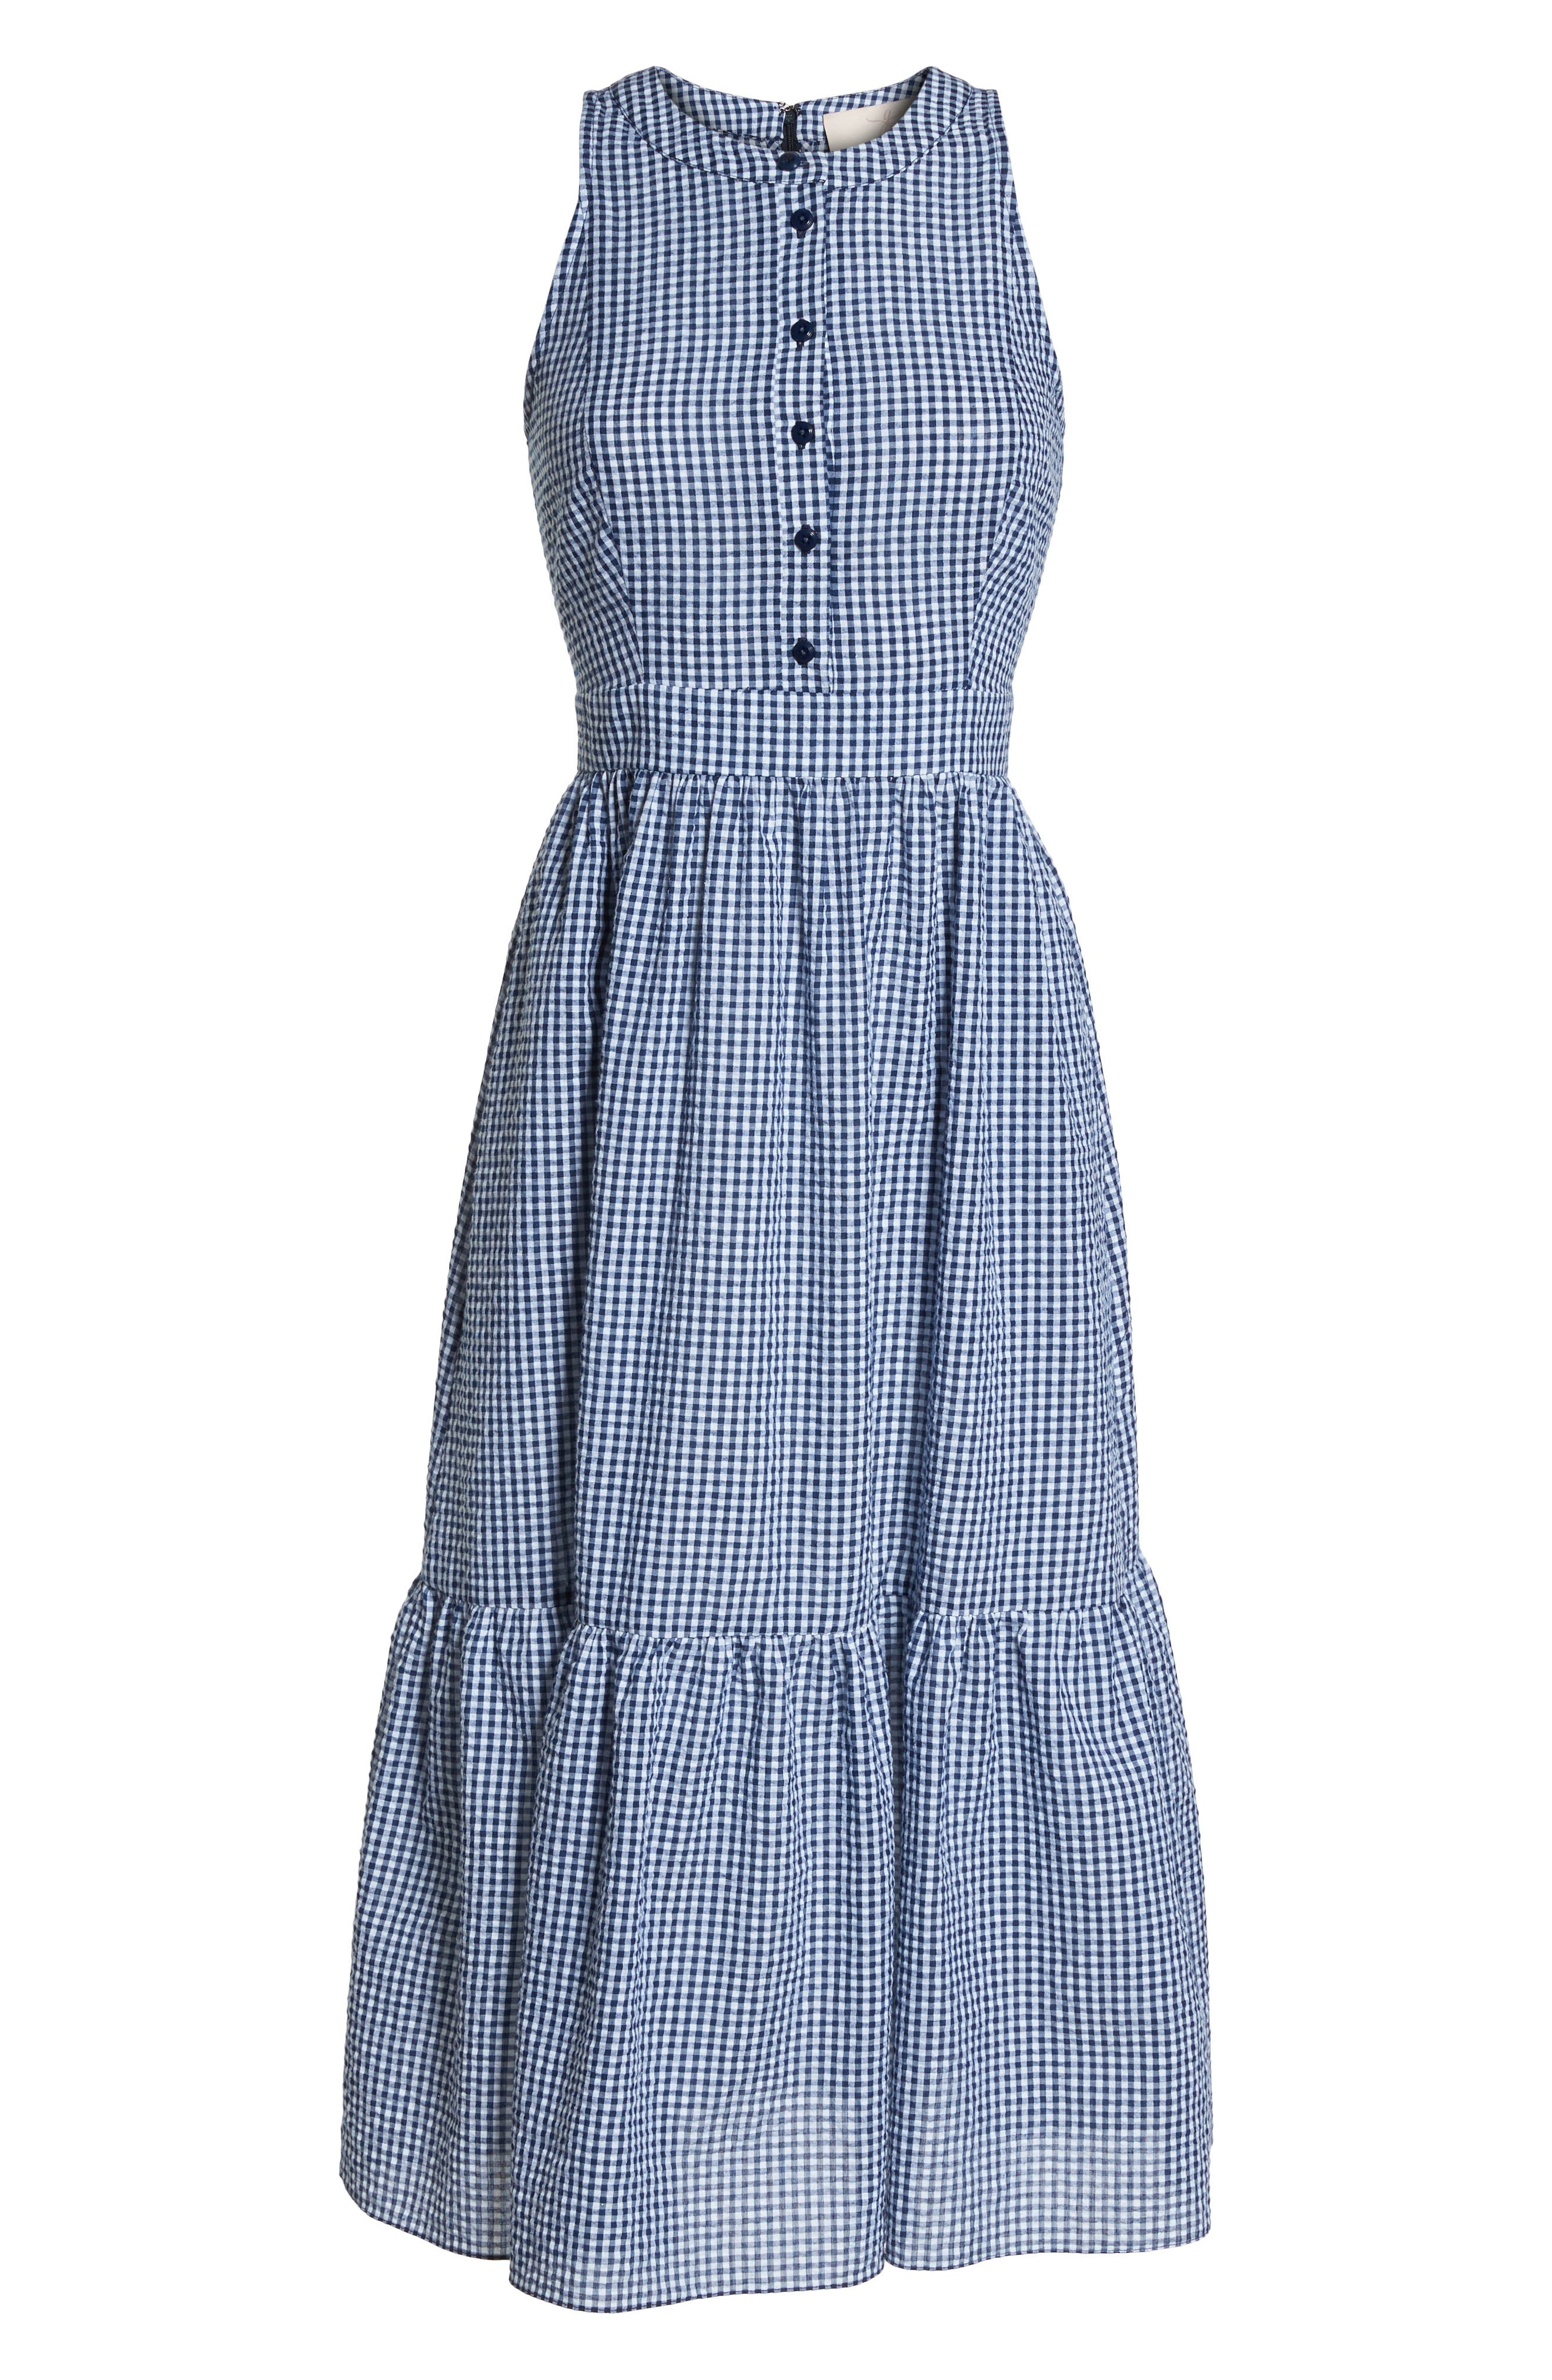 Ardith Gingham Fit & Flare Midi Dress,                             Alternate thumbnail 8, color,                             Blue/ White